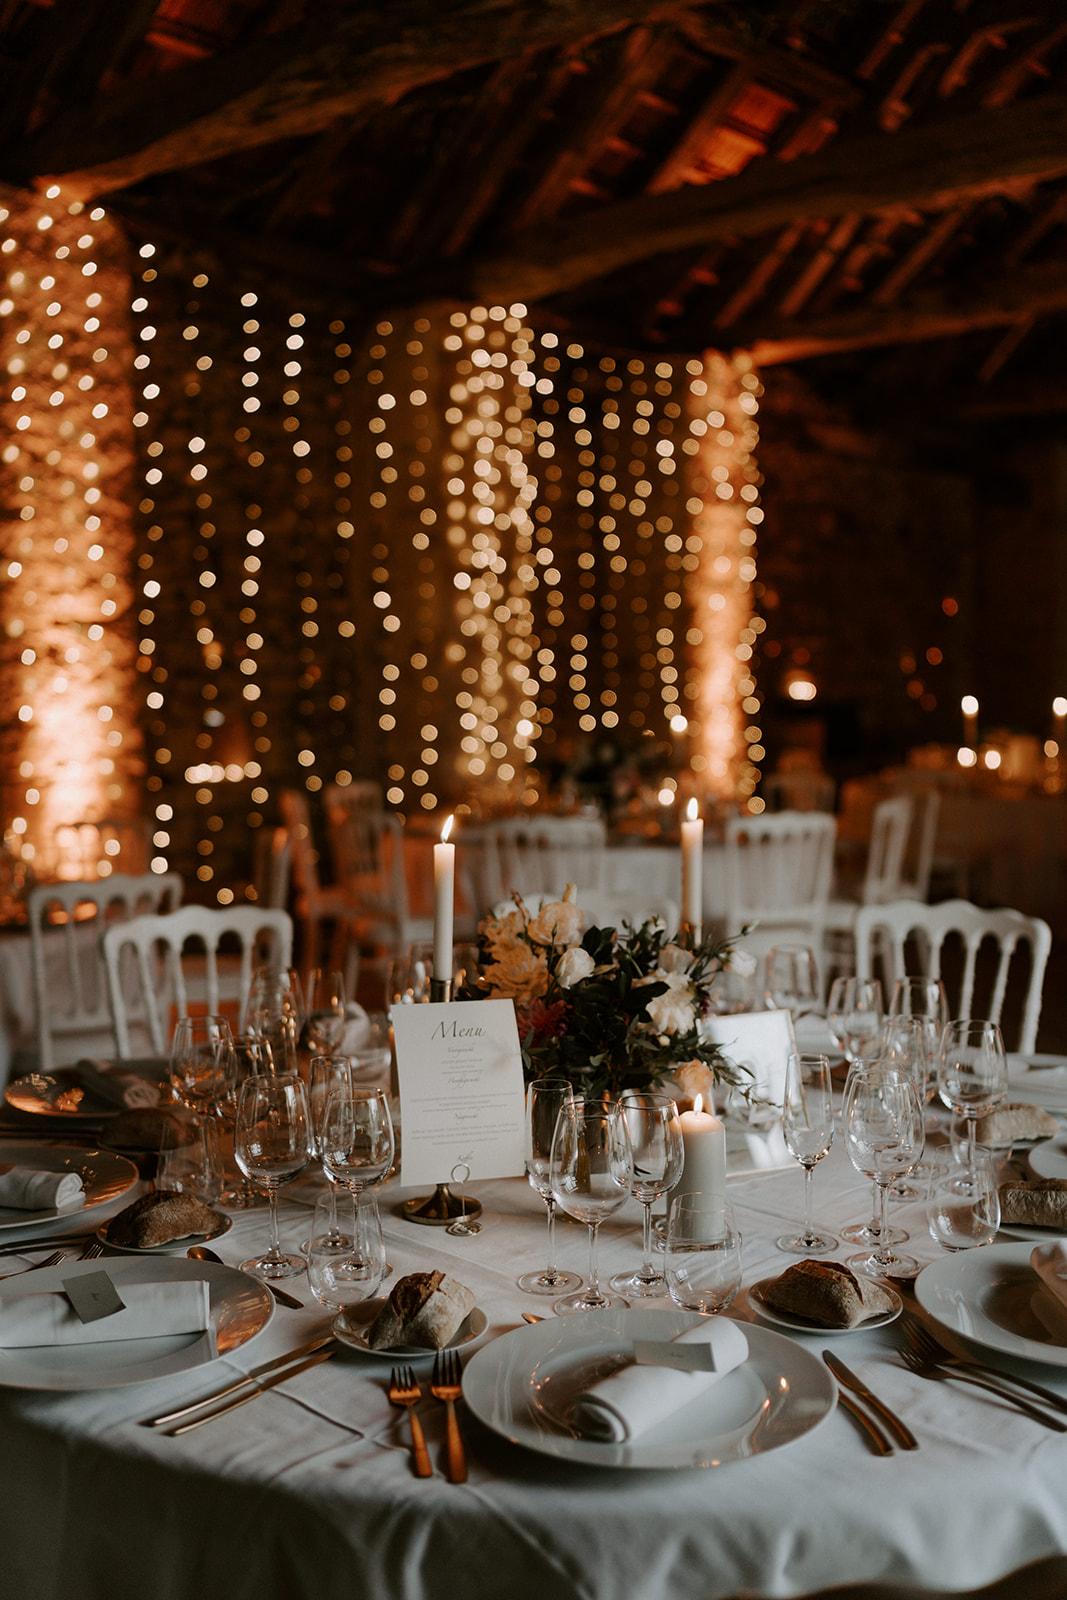 decoration-mariage-sparkly-repas-soiree